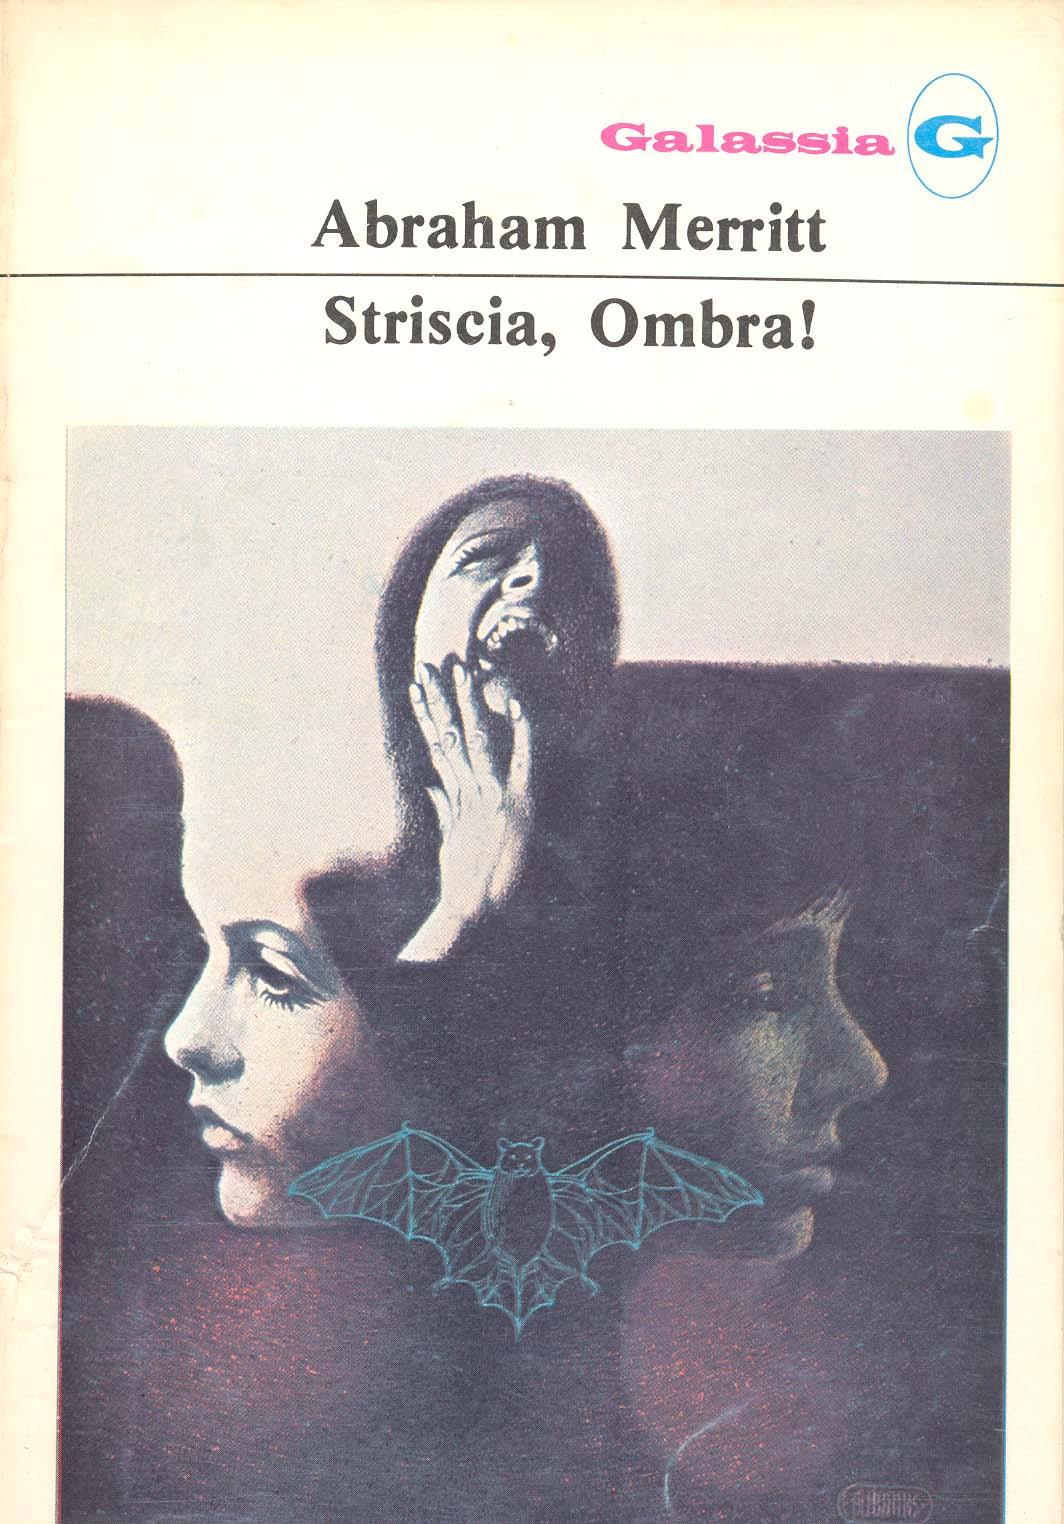 Striscia, Ombra!